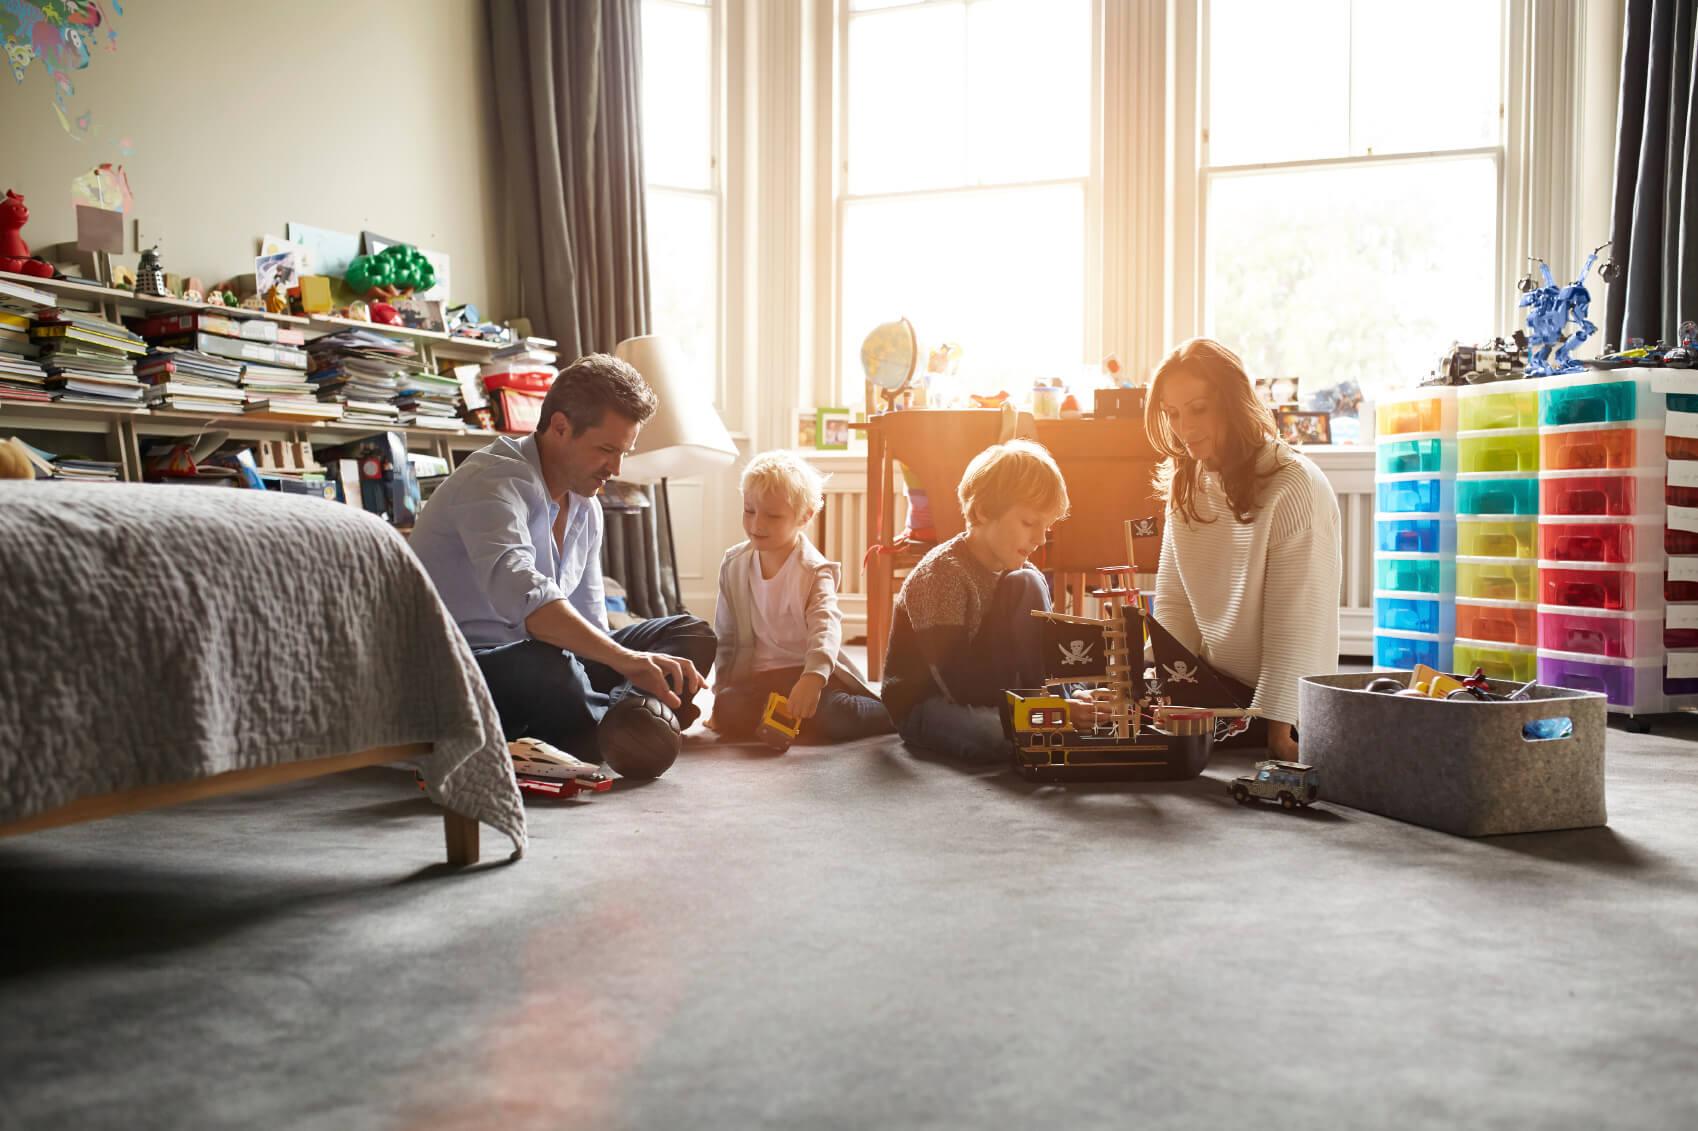 martesa pas femijeve, si ndikojne femijet ne martese